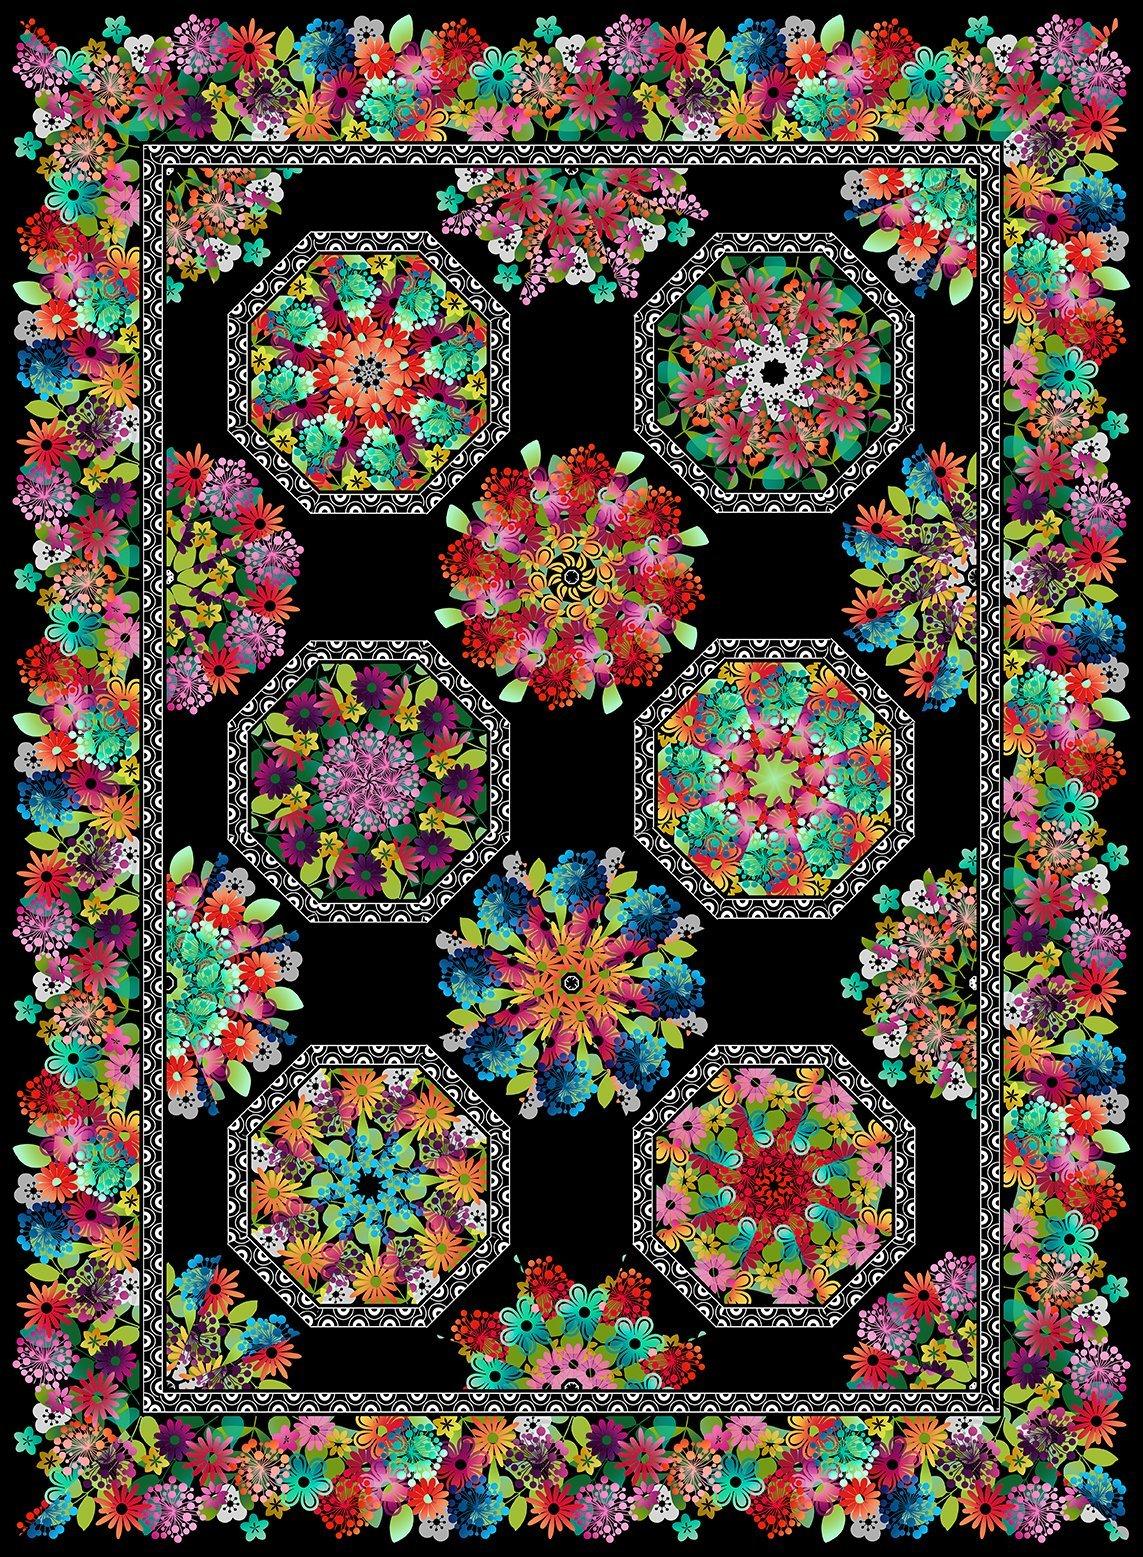 CSMD-KAGG KM - A GROOVY GARDEN - KALEIDOSCOPE QUILT KIT MULTI 65 x 87.5